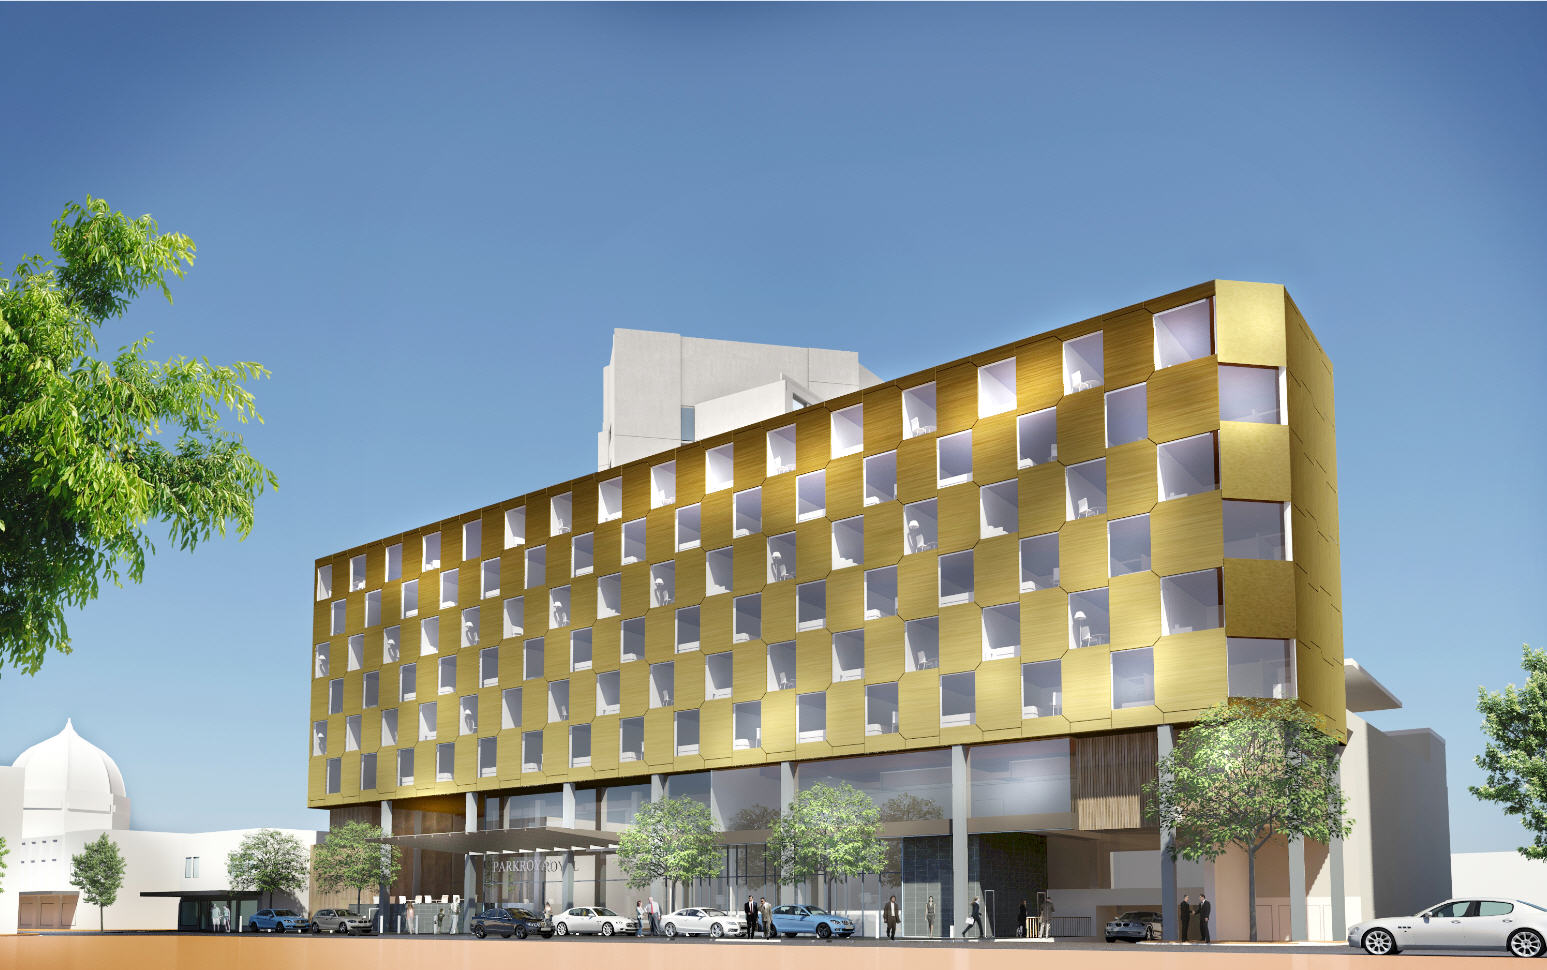 PARKROYAL Parramatta Exterior view 1